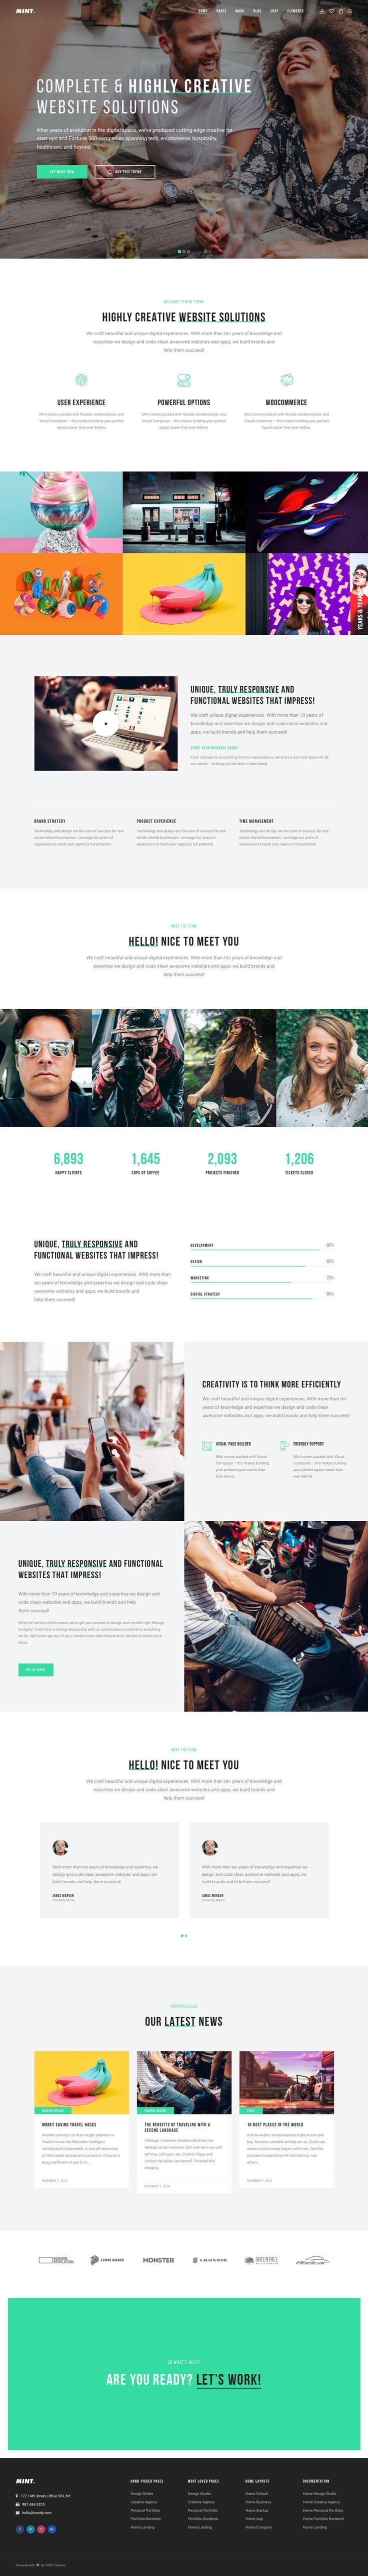 Mint Theme for Creatives on Behance